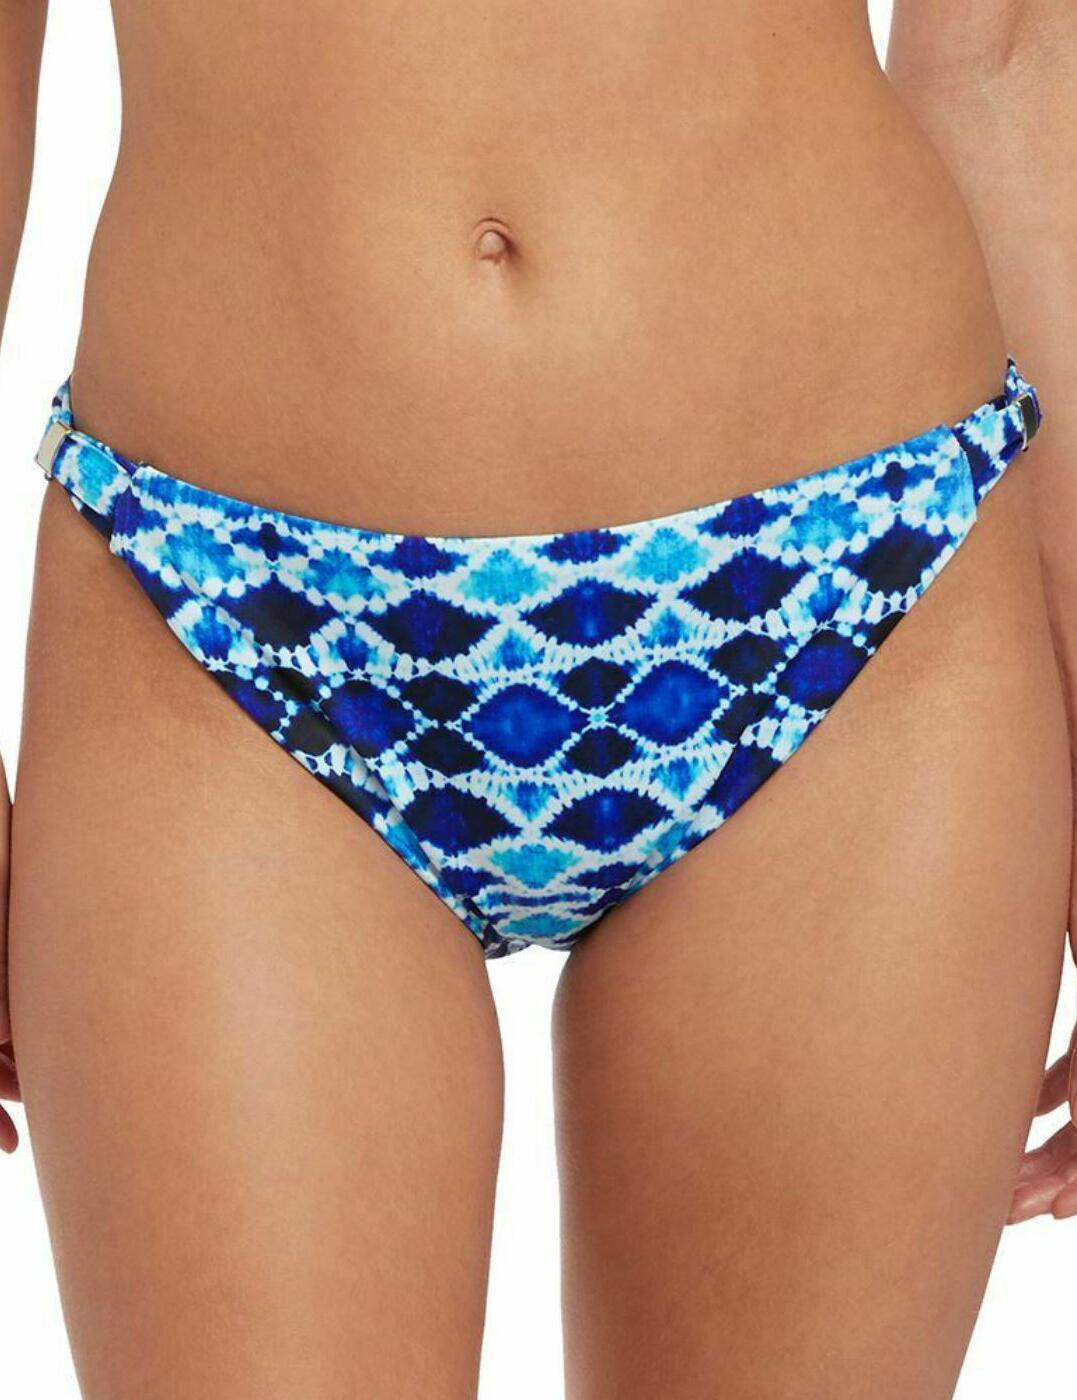 6517 Fantasie Tuscany Mid Rise Bikini Brief - 6517 Ink